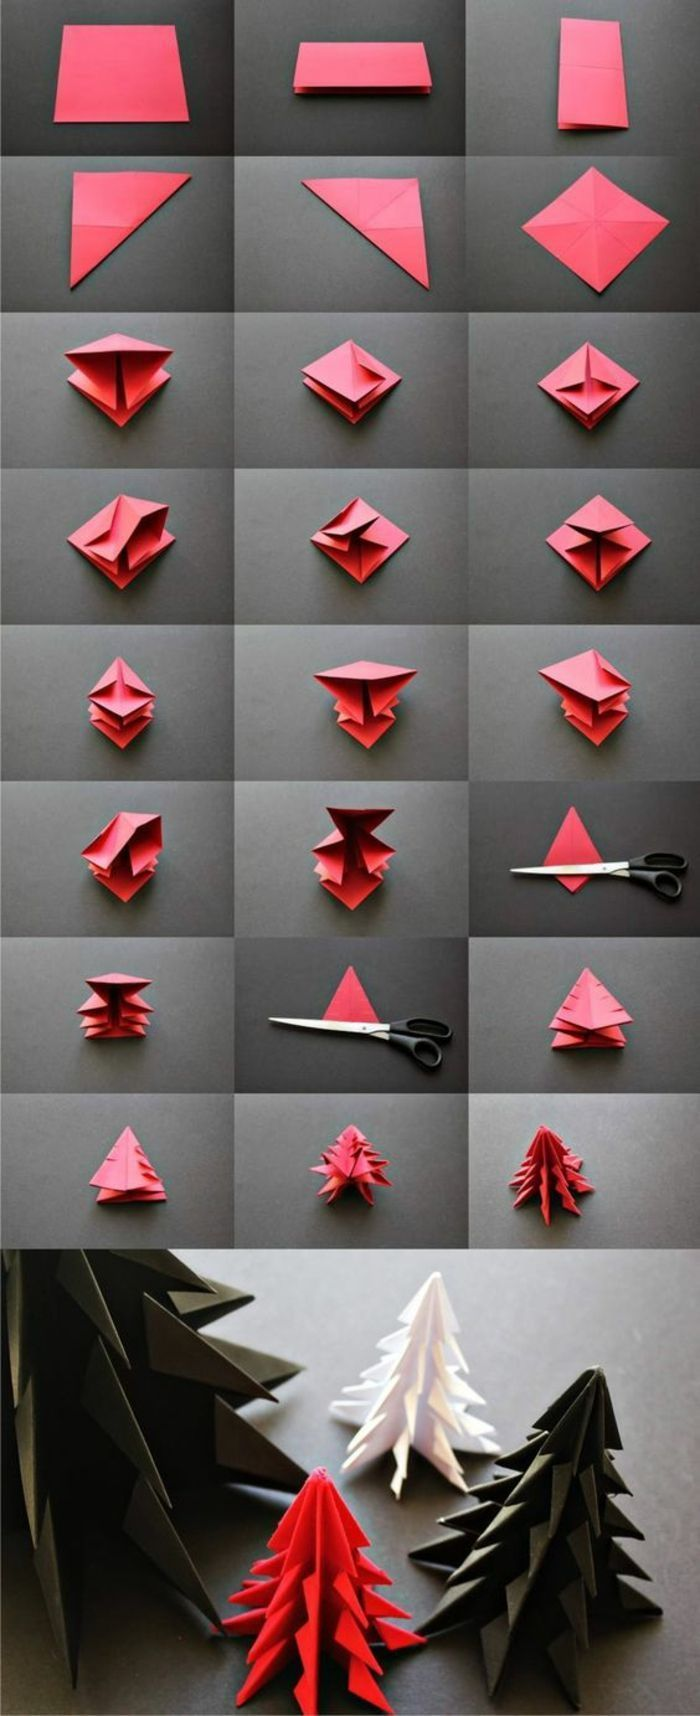 Decoration De Noel Sapin En Origami Technique De Pliage Papier Facile Origami Techniques Origami Christmas Ornament Christmas Origami